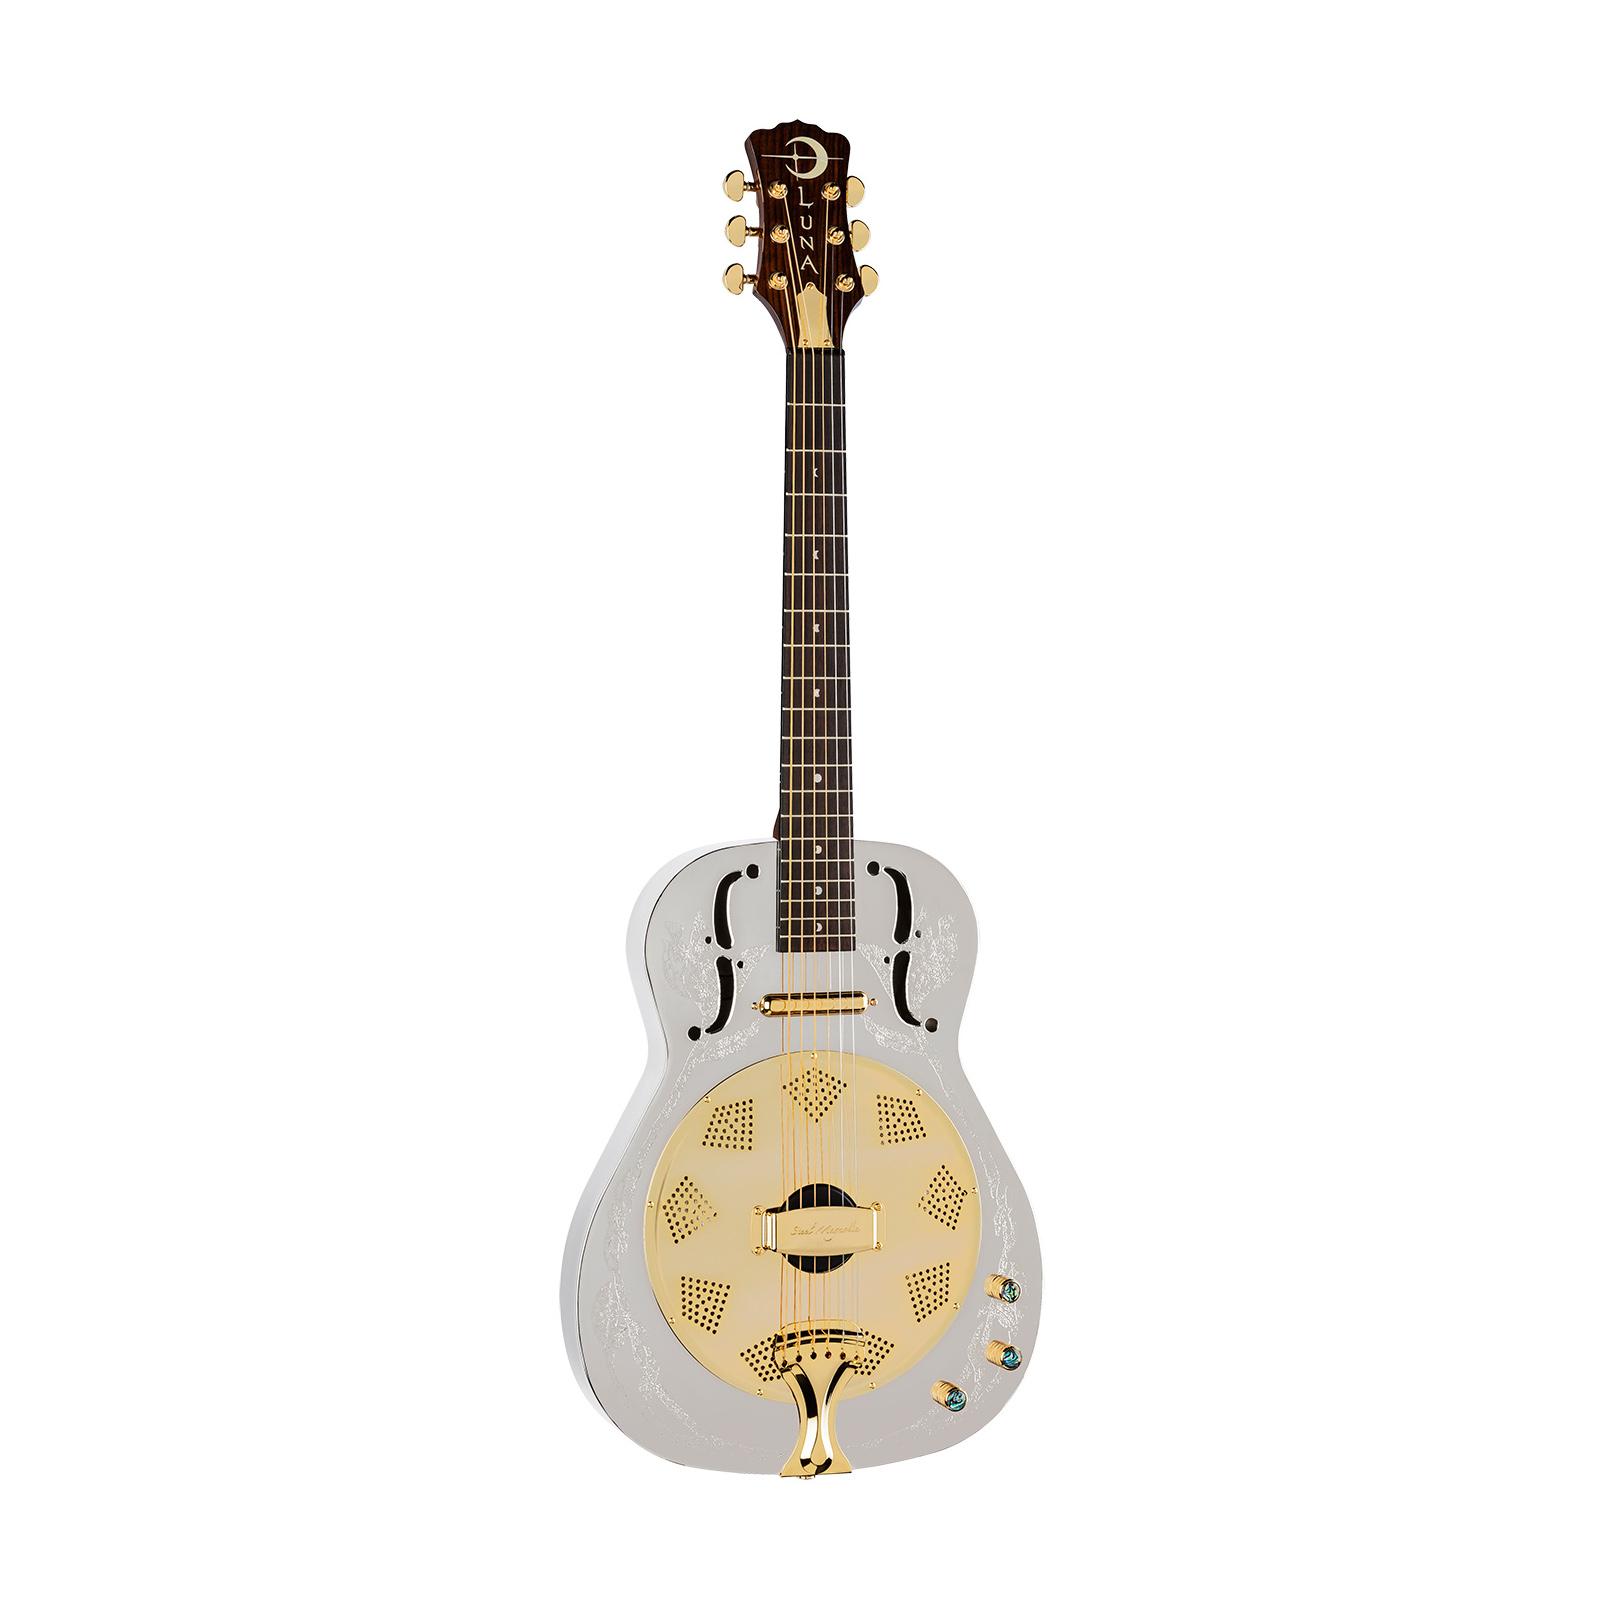 Luna Steel Magnolia Resonator Acoustic / Electric